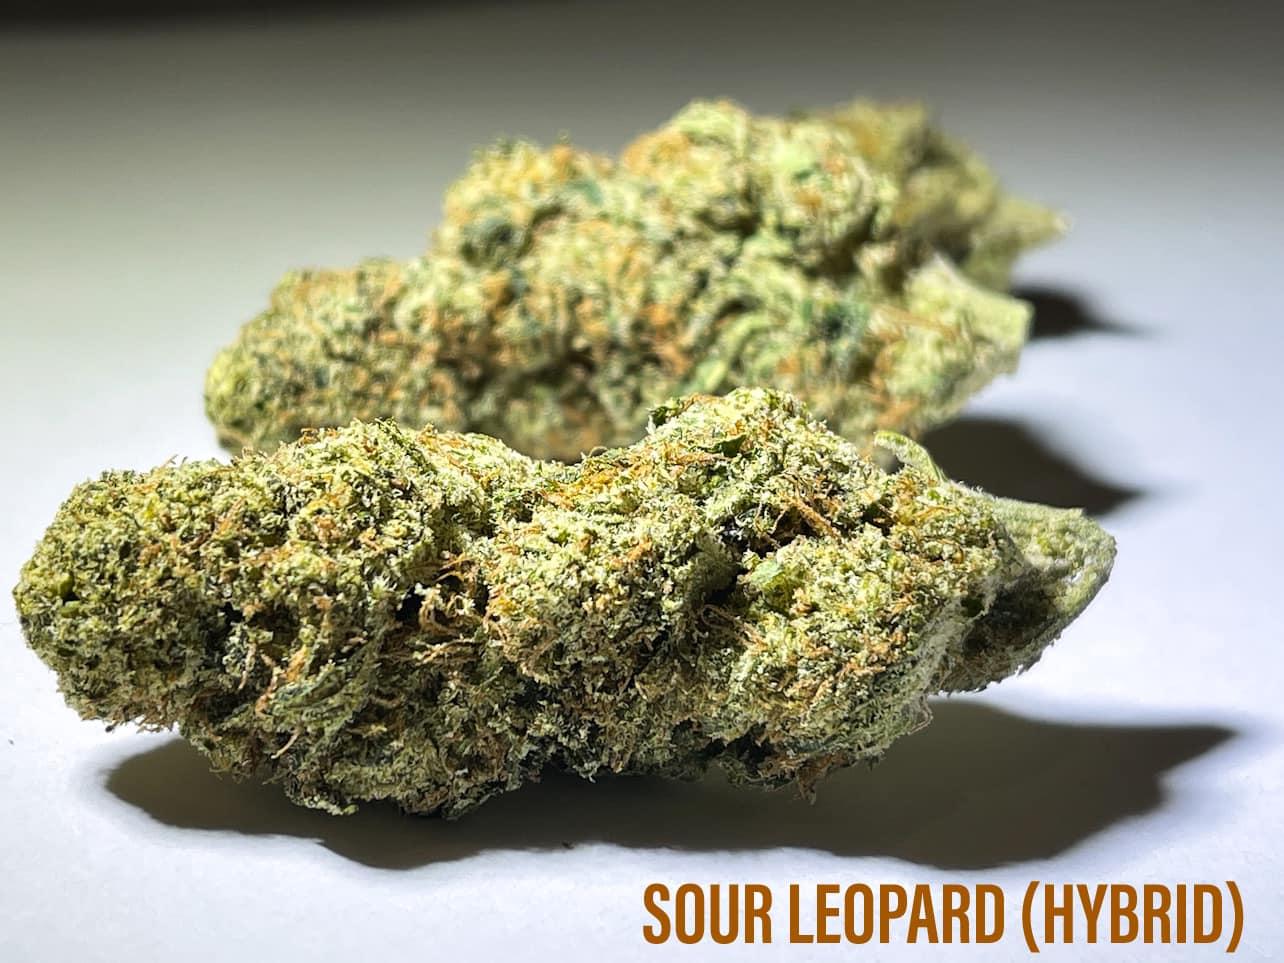 Hybrid strain Sour Leopard